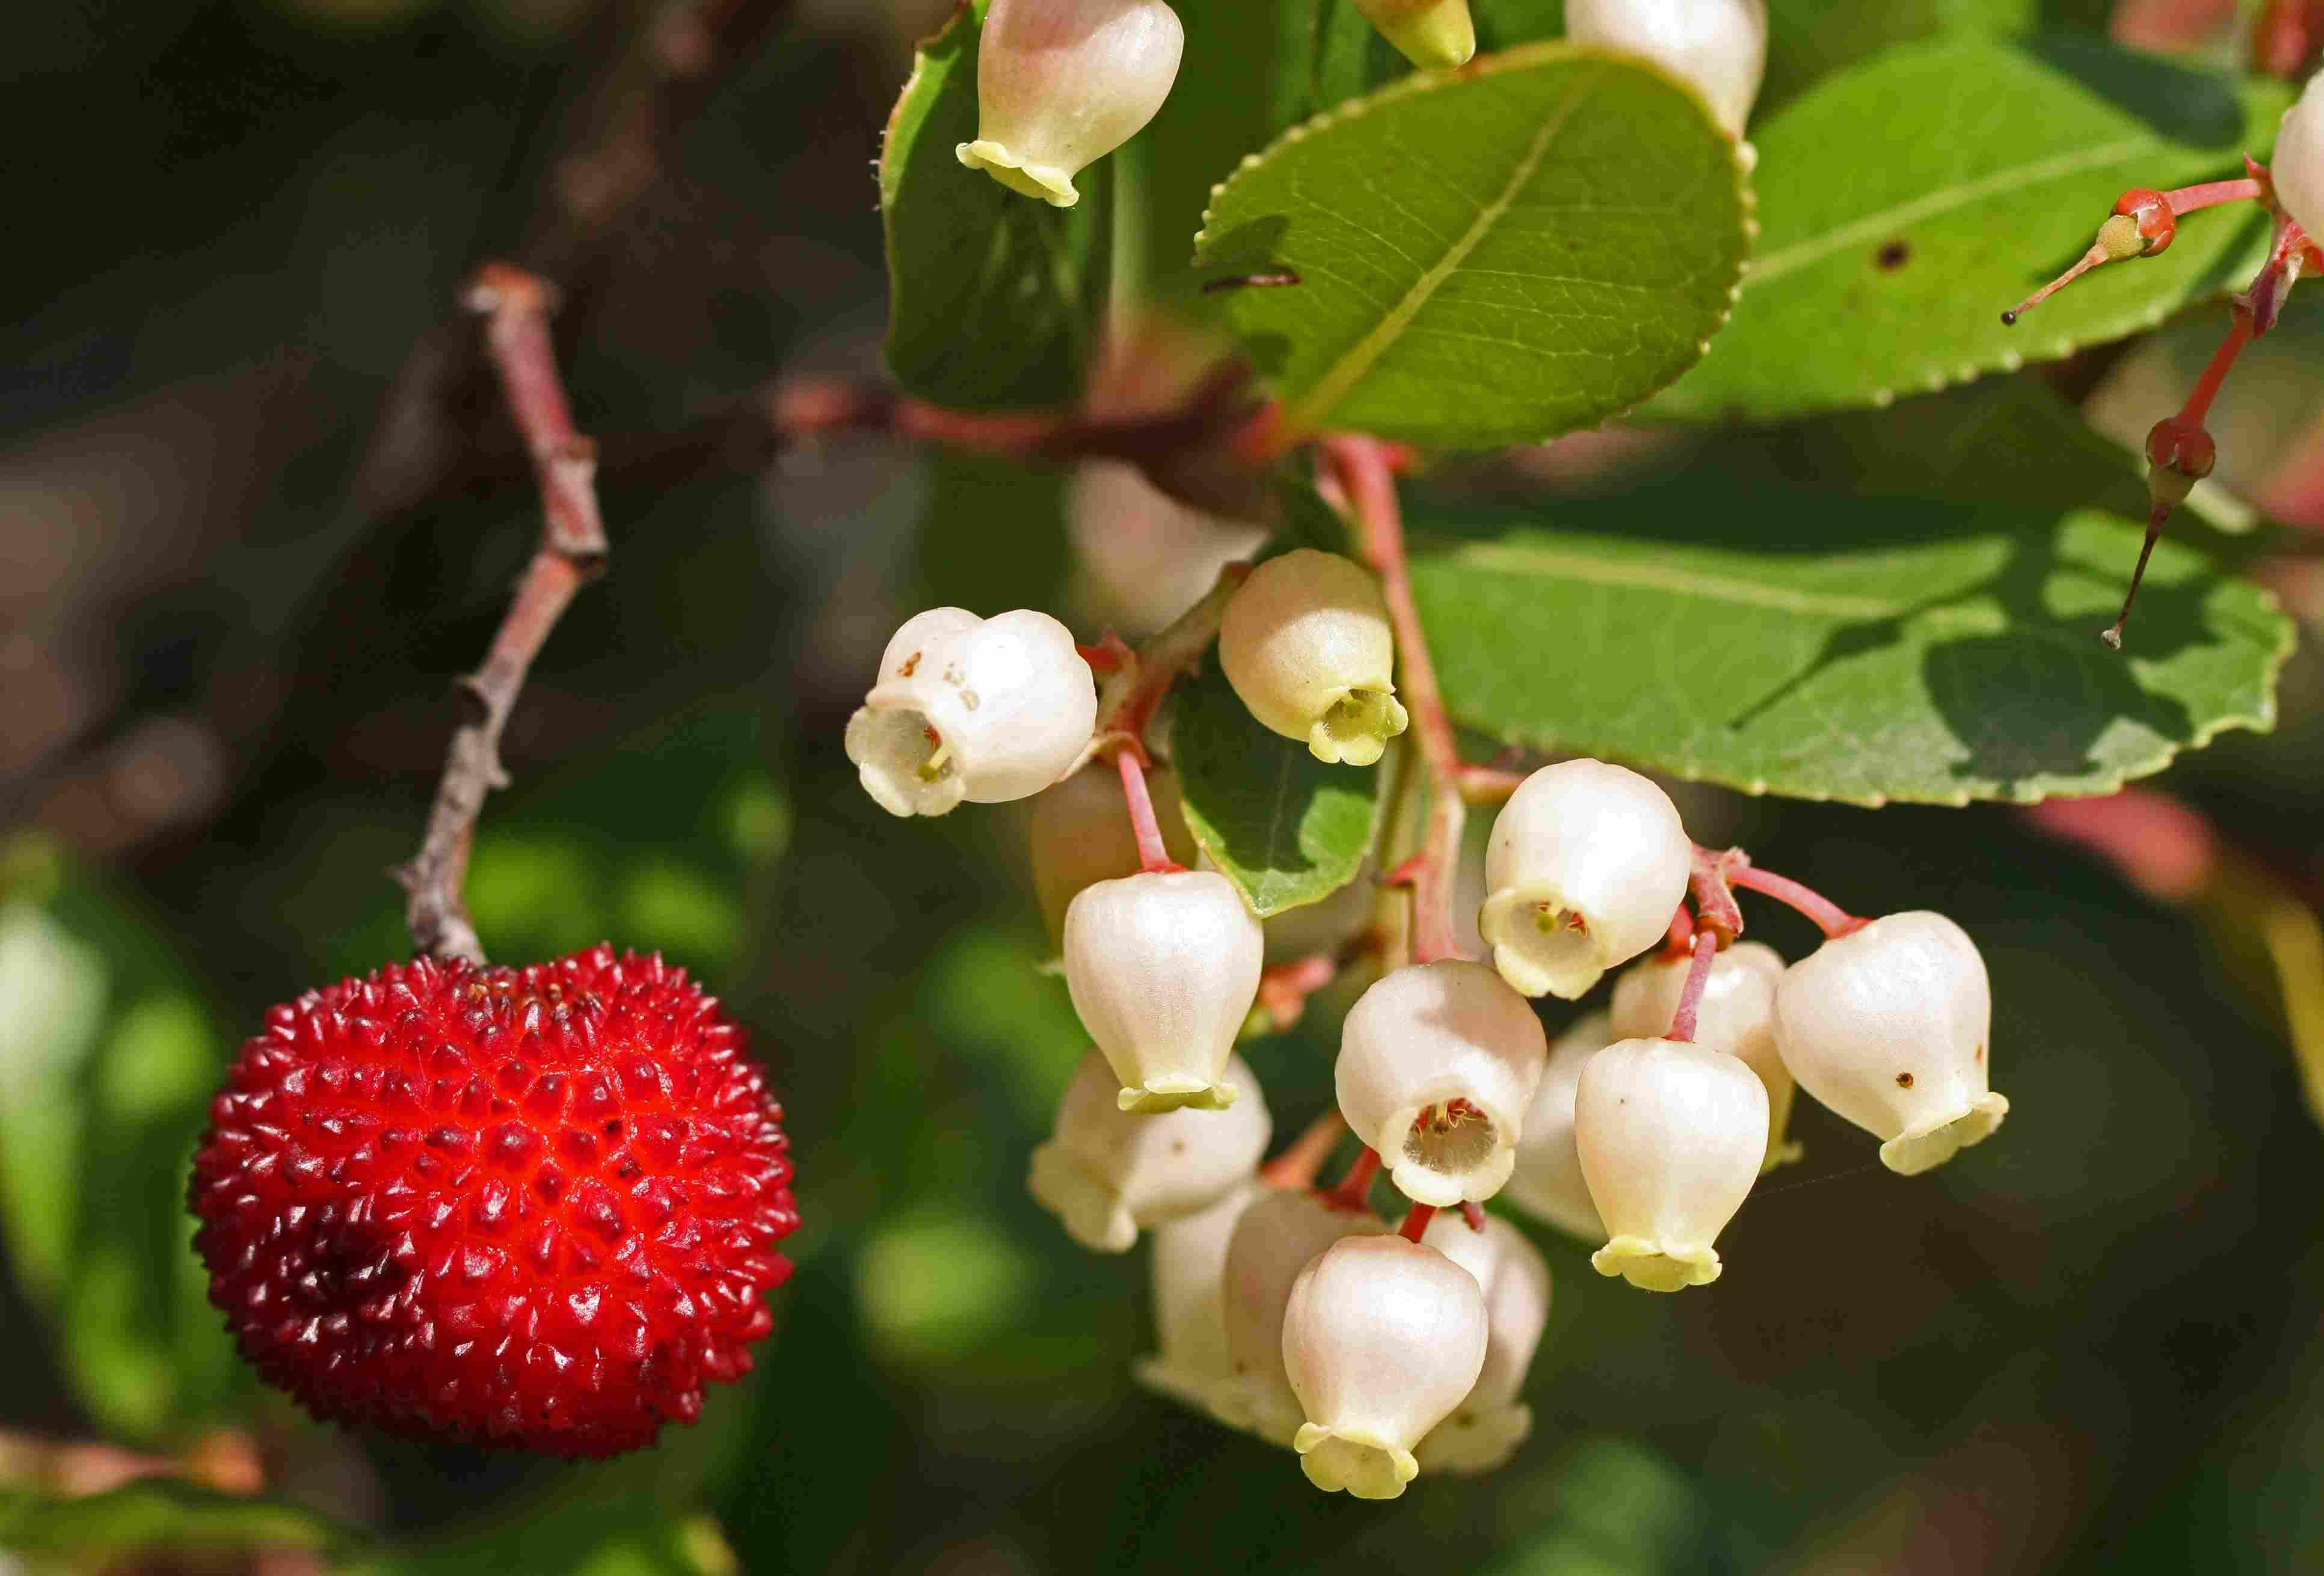 Arbutus unedo (strawberry tree) in bloom